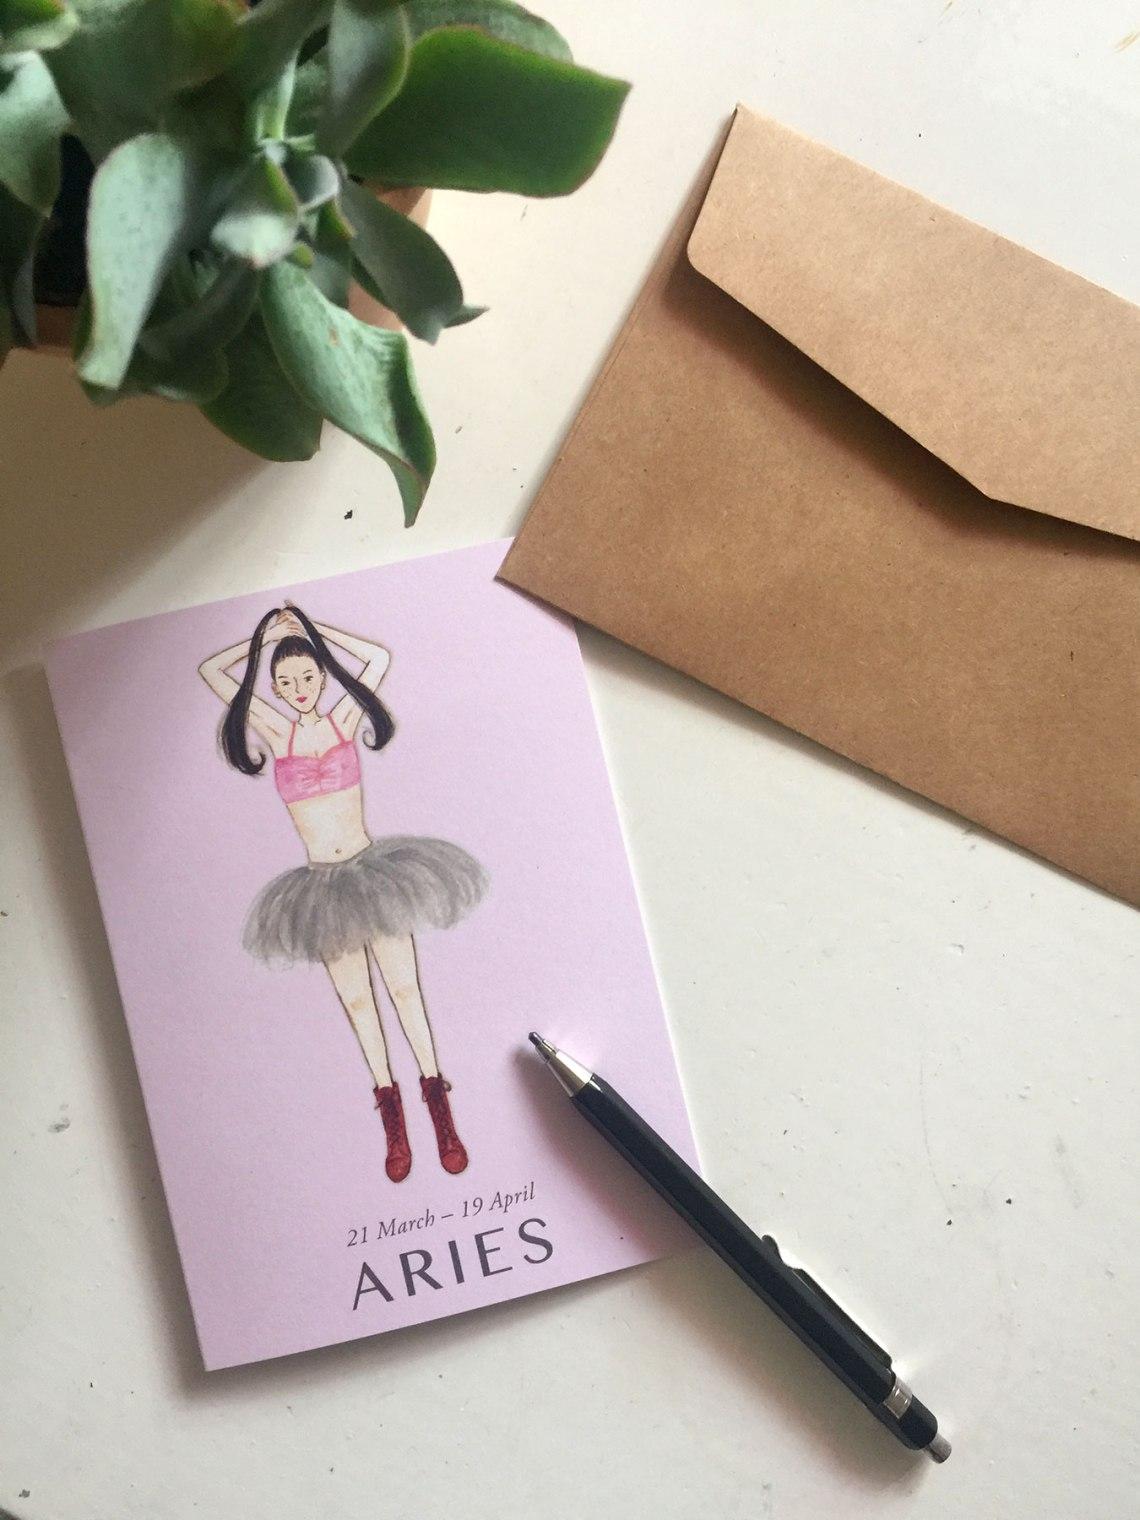 aries_03